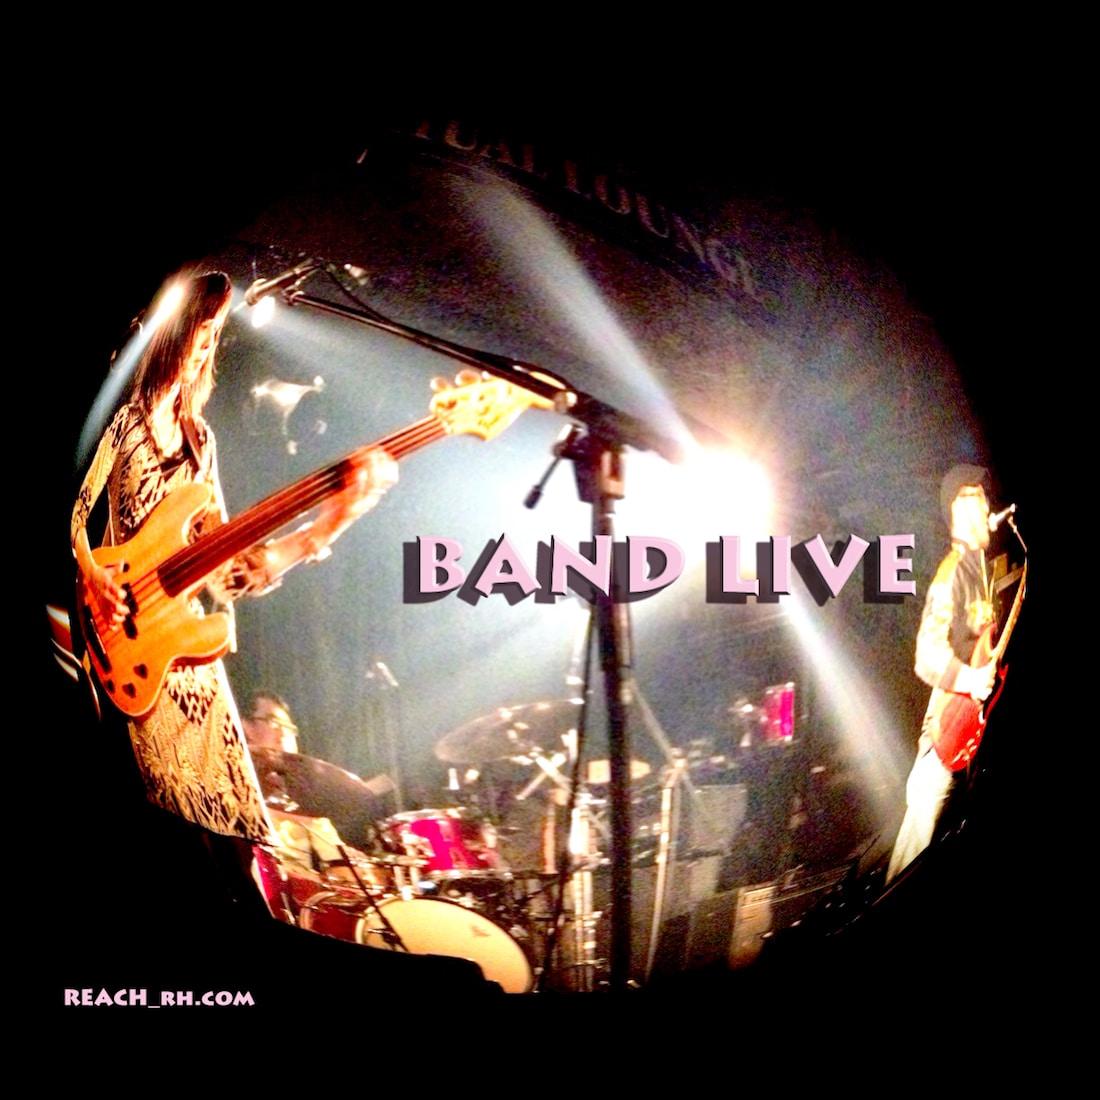 BAND LIVE